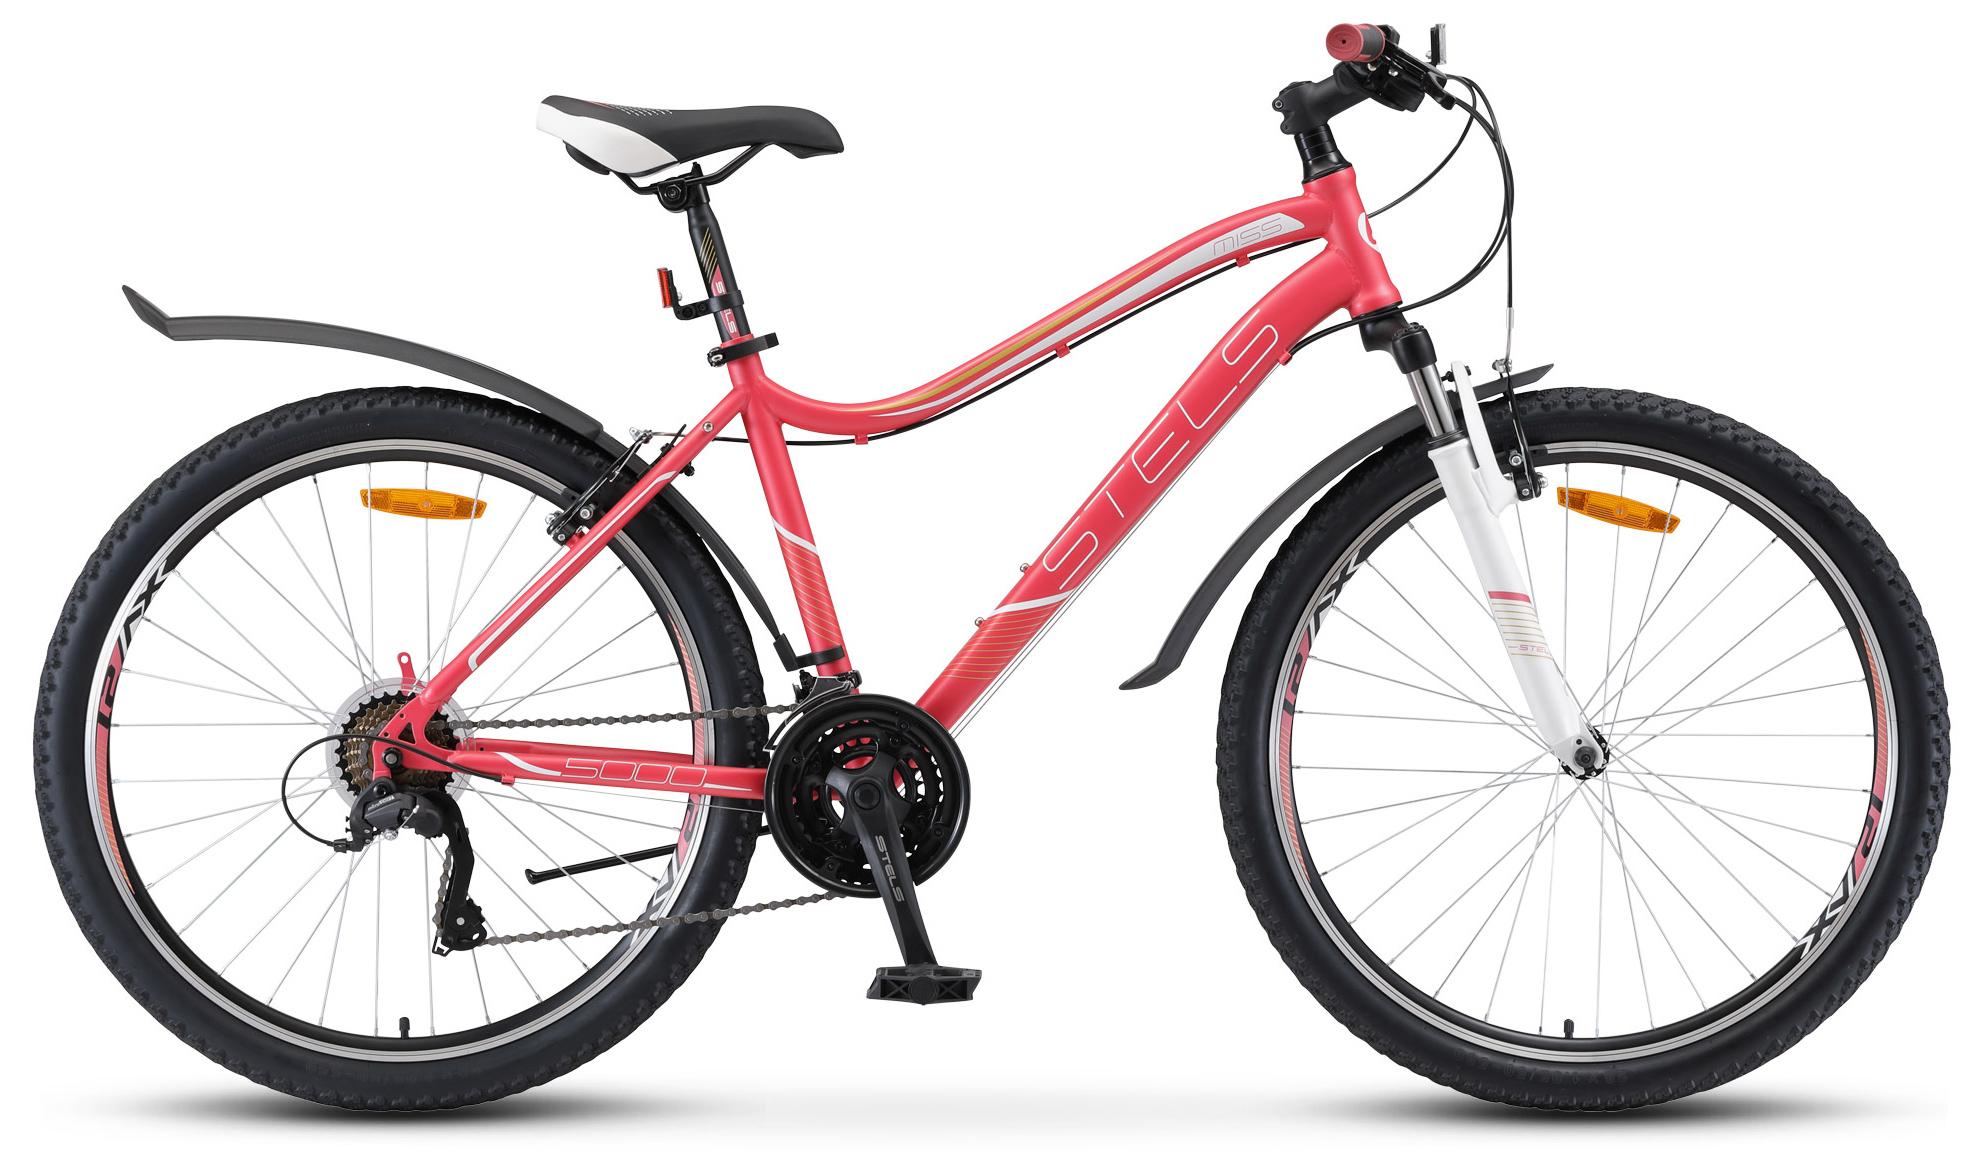 Велосипед Stels Miss 5000 V 26 (V040) 2019 велосипед stels miss 9500 disc 2013